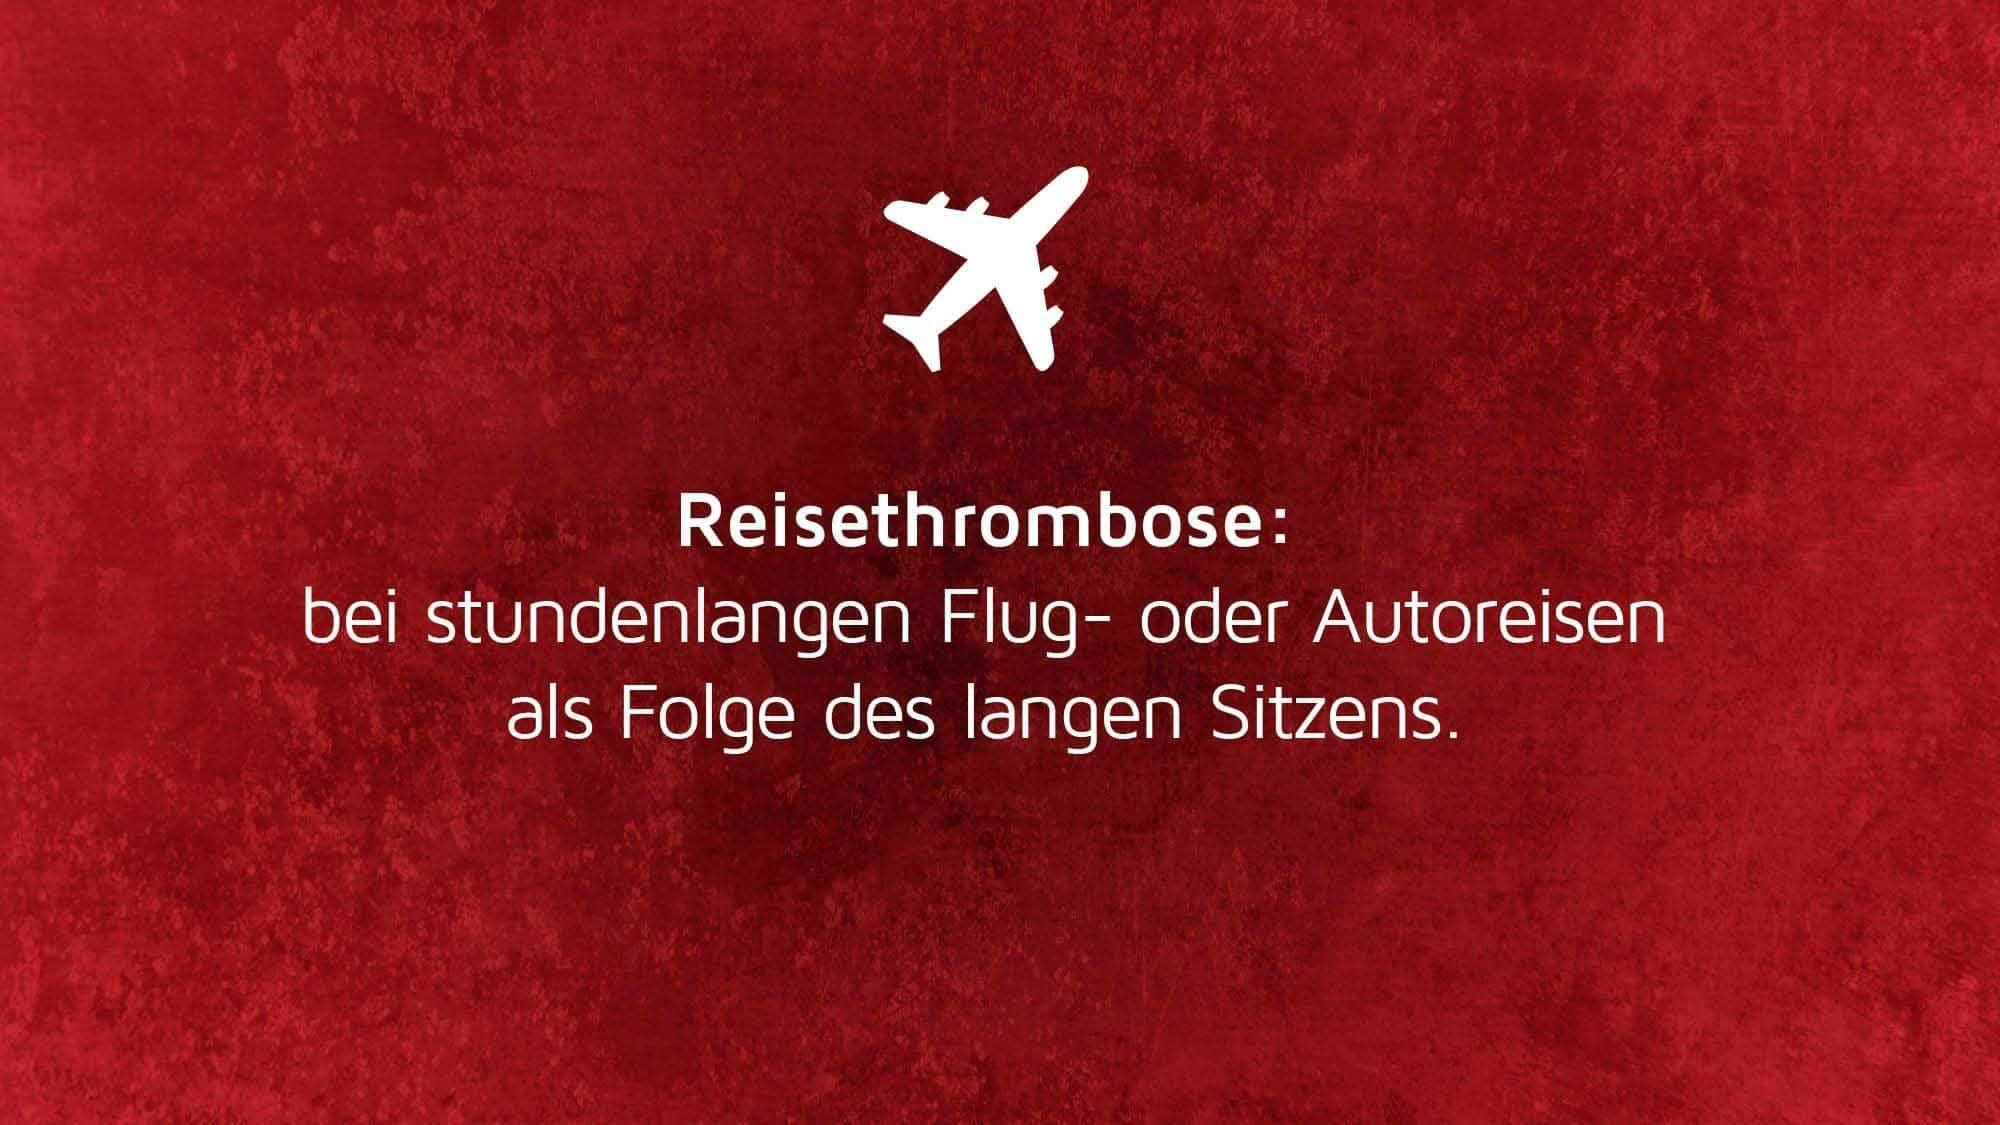 Risikofaktoren Thrombose: Reisethrombose